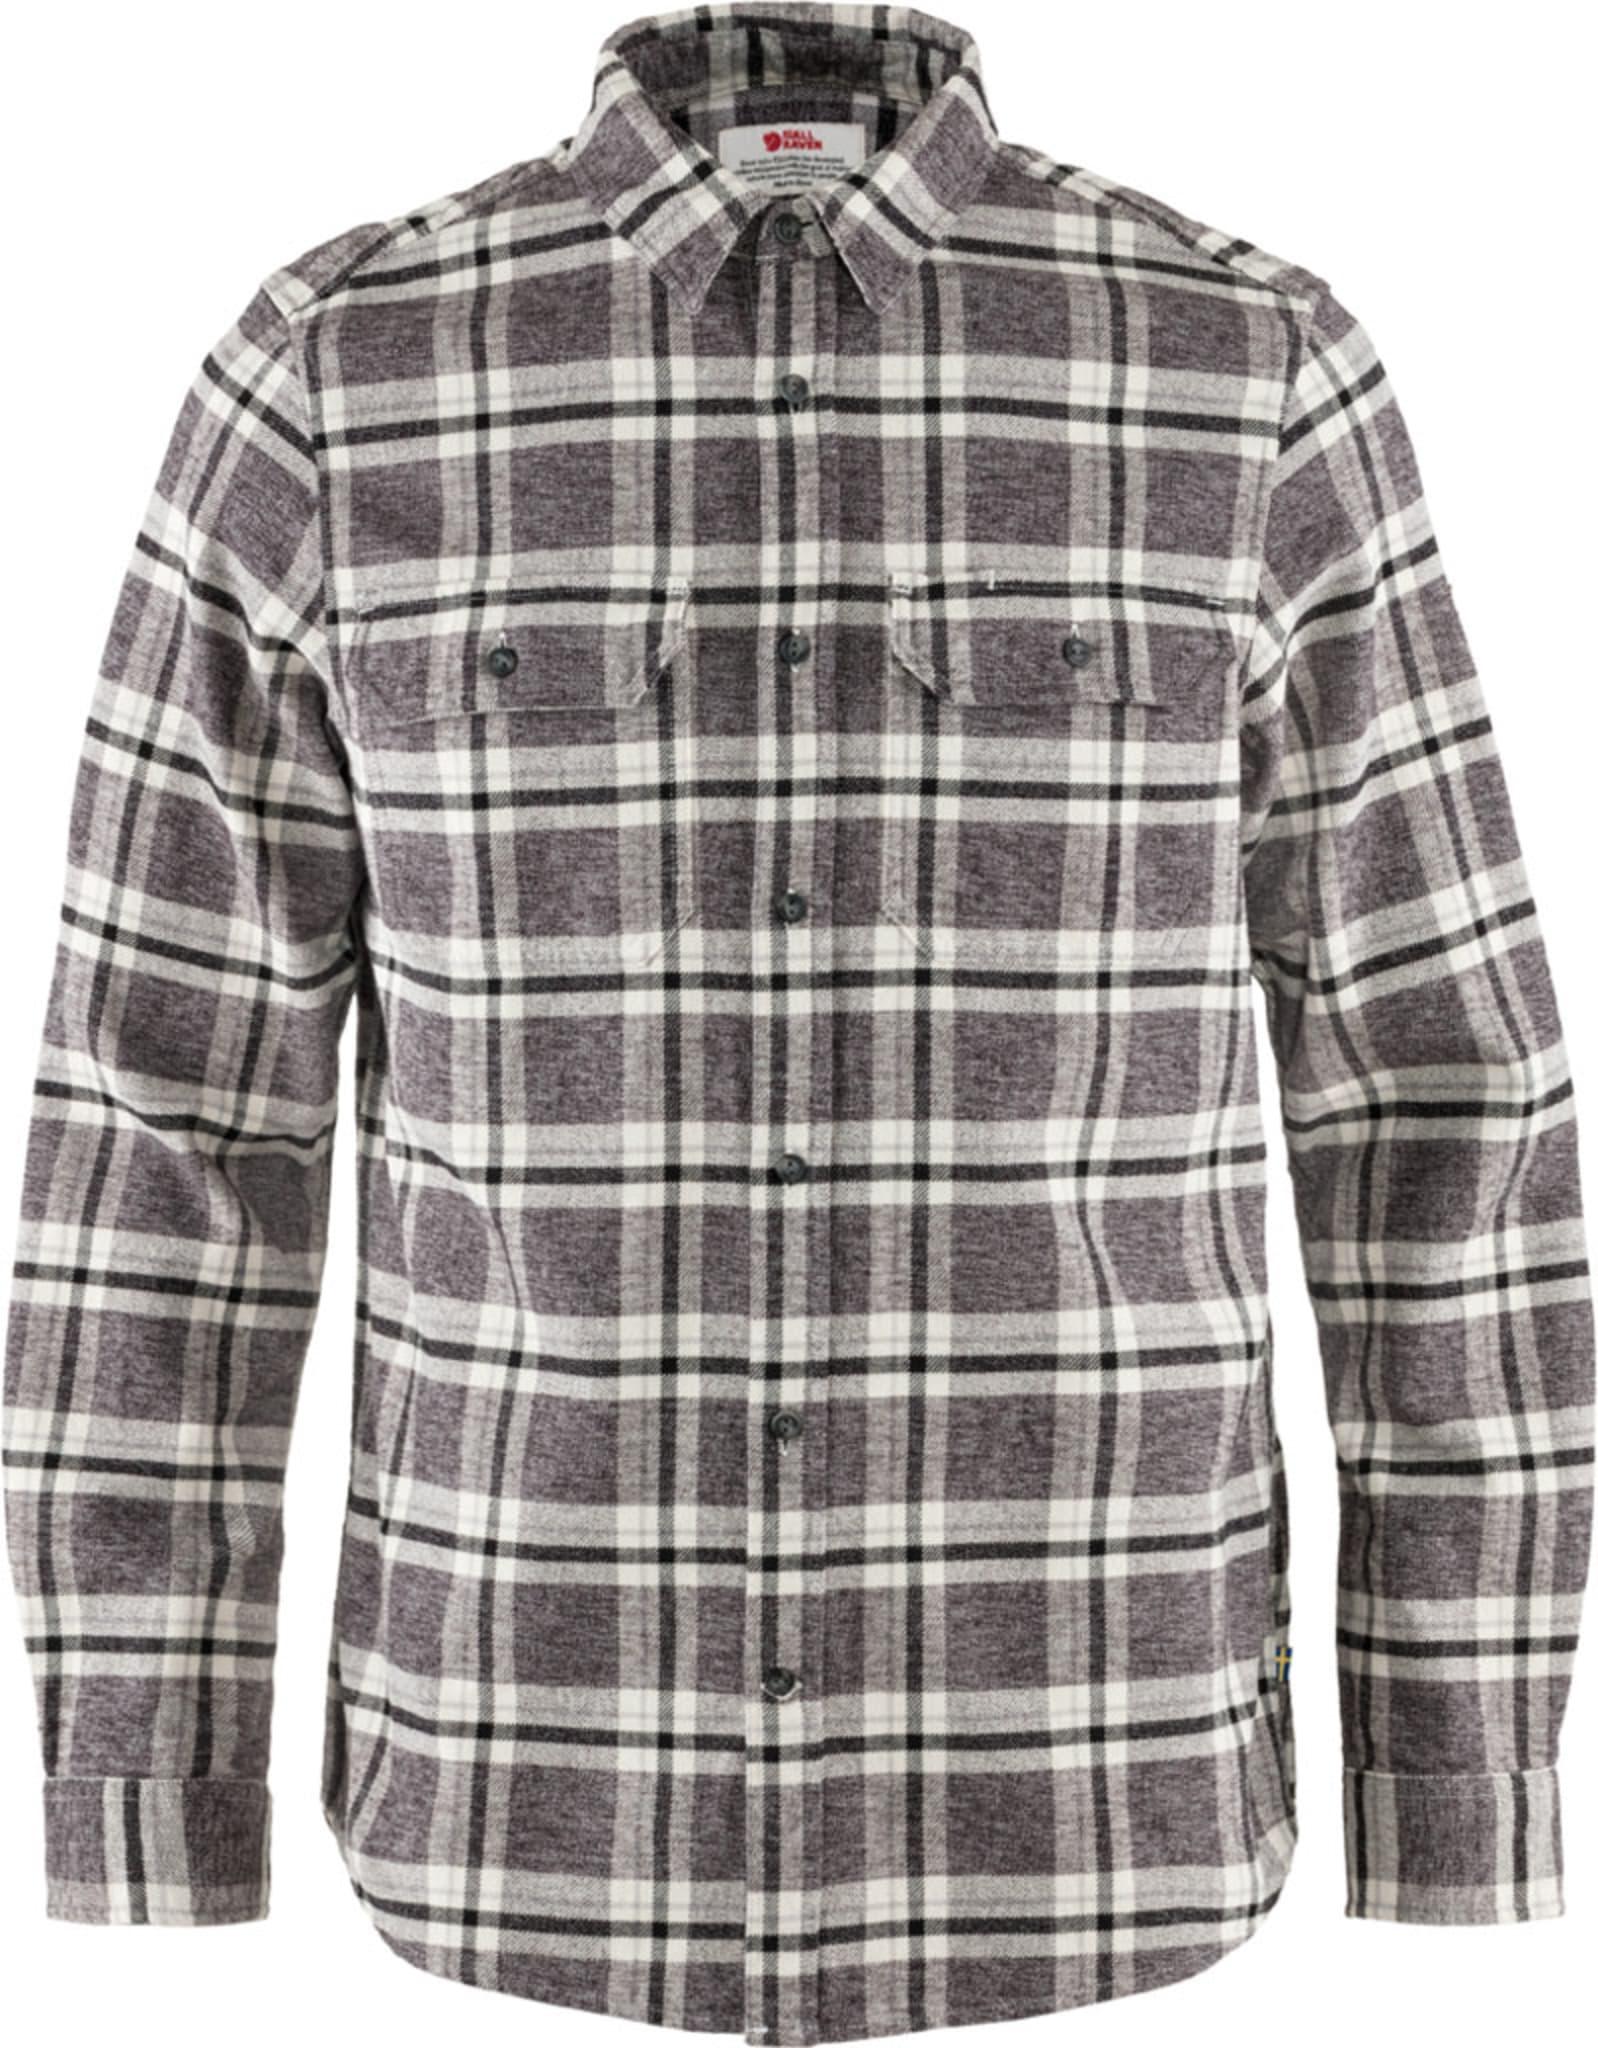 Klassisk langermet flanellskjorte med komfortabel passform.